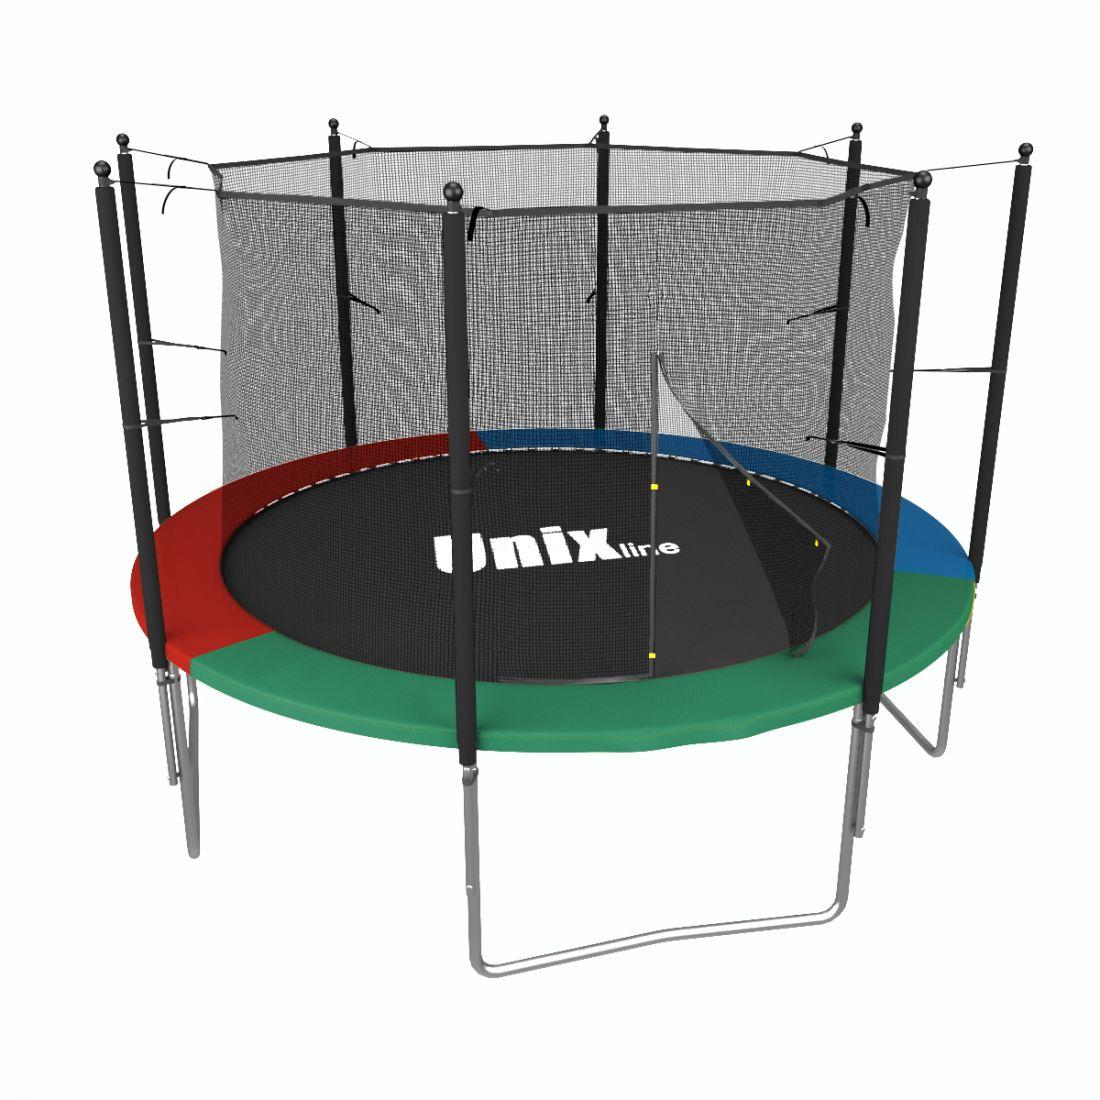 Батут Unix line Simple 6 ft Color/Green (inside)